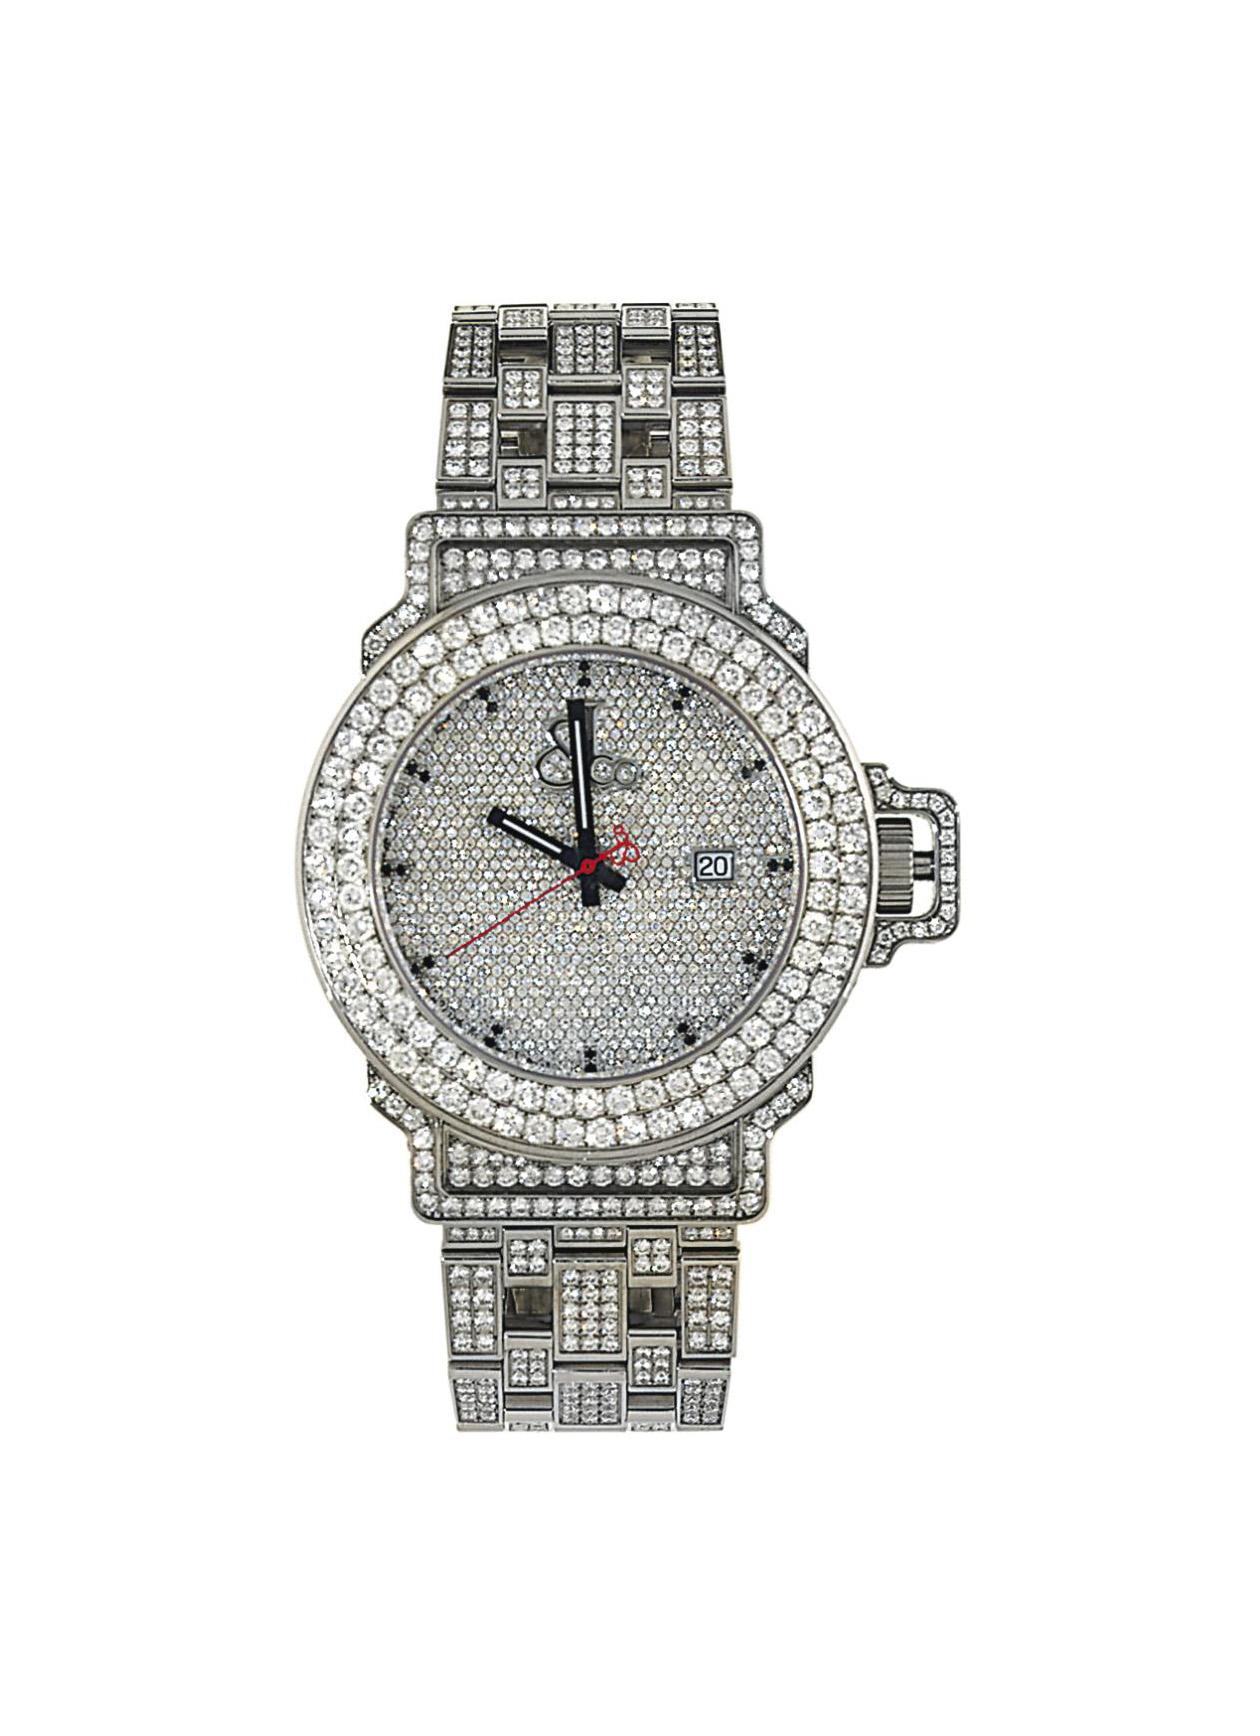 A diamond-set automatic wristwatch, by Jacob & Co.